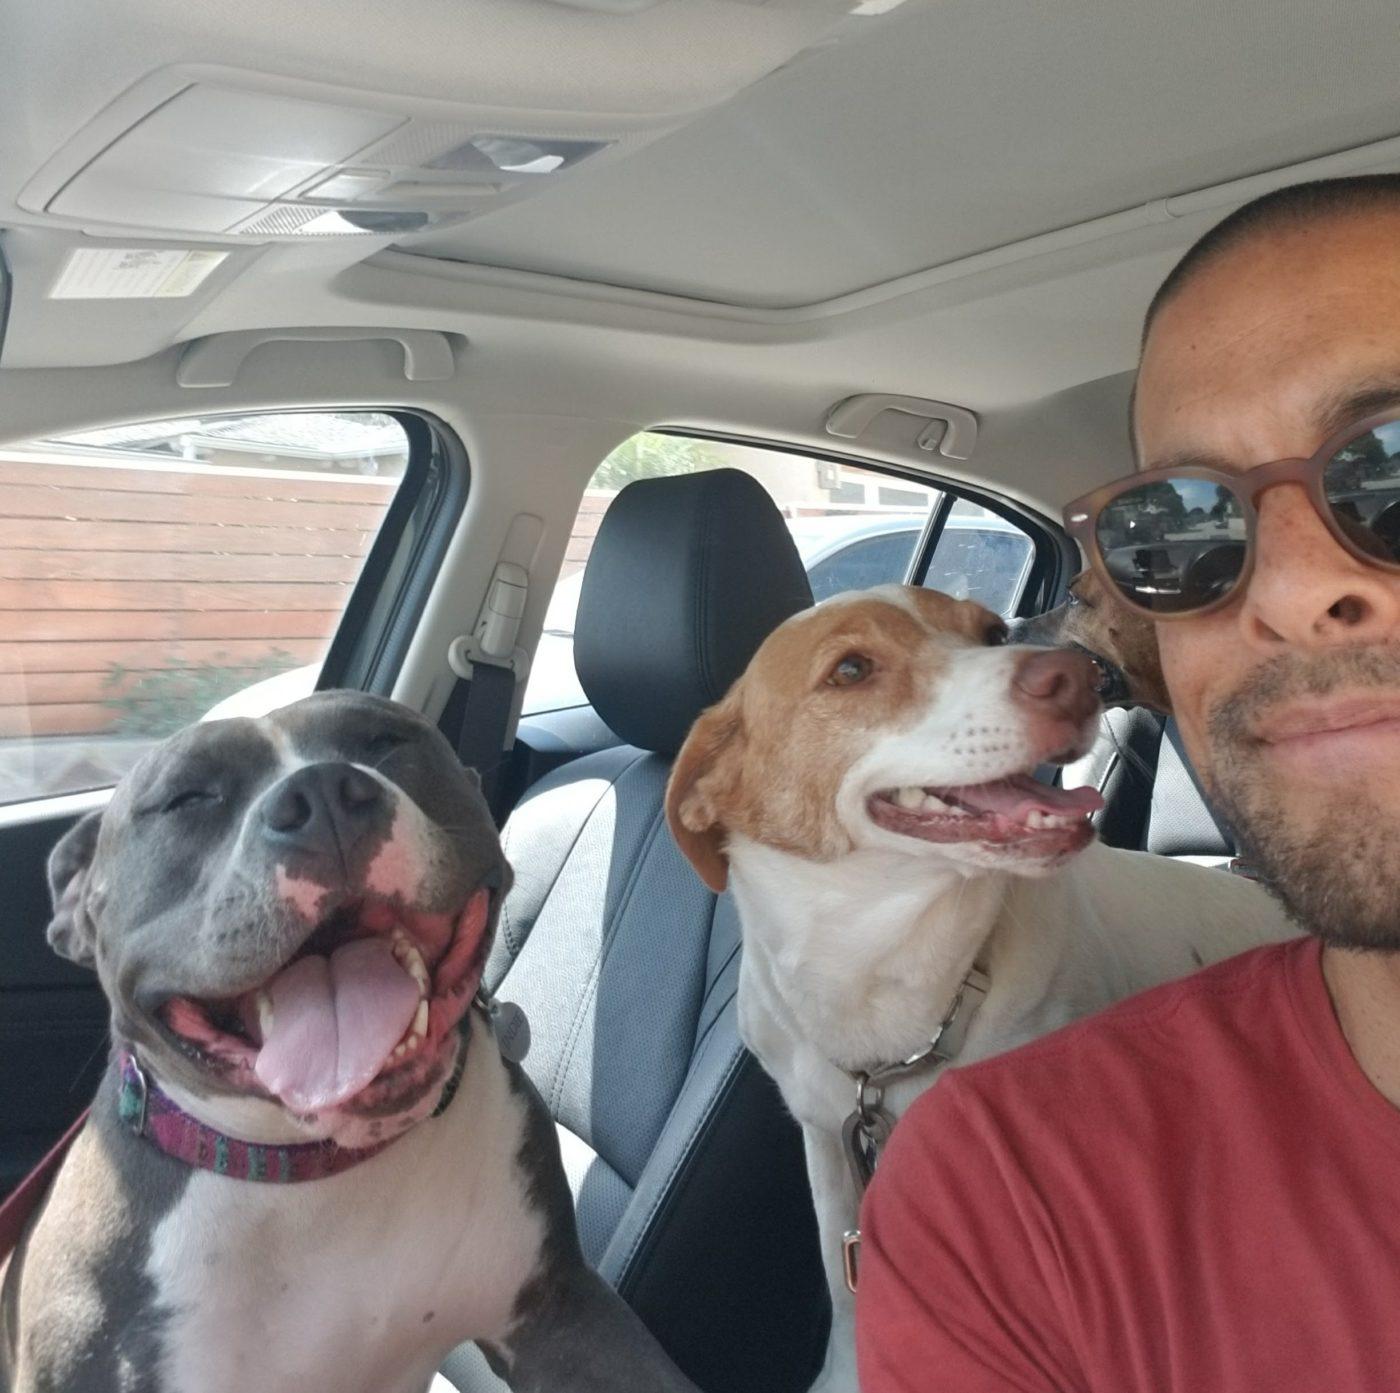 #dogpark, #mypitbull, Justin Scher, Bark Busters San Diego